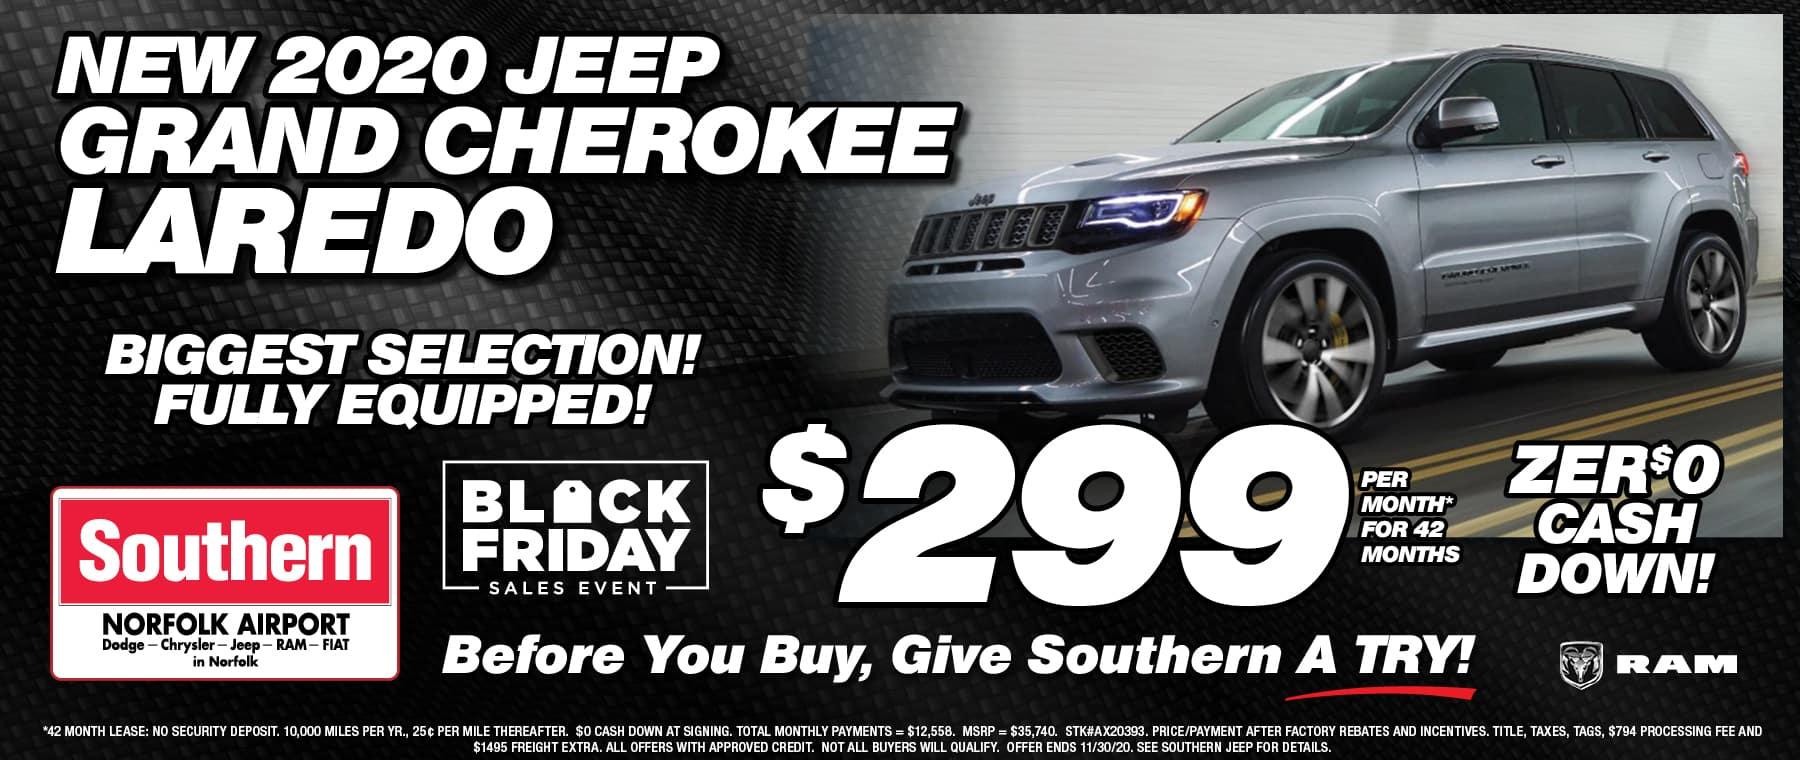 Jeep Grand Cherokee Southern Dodge November